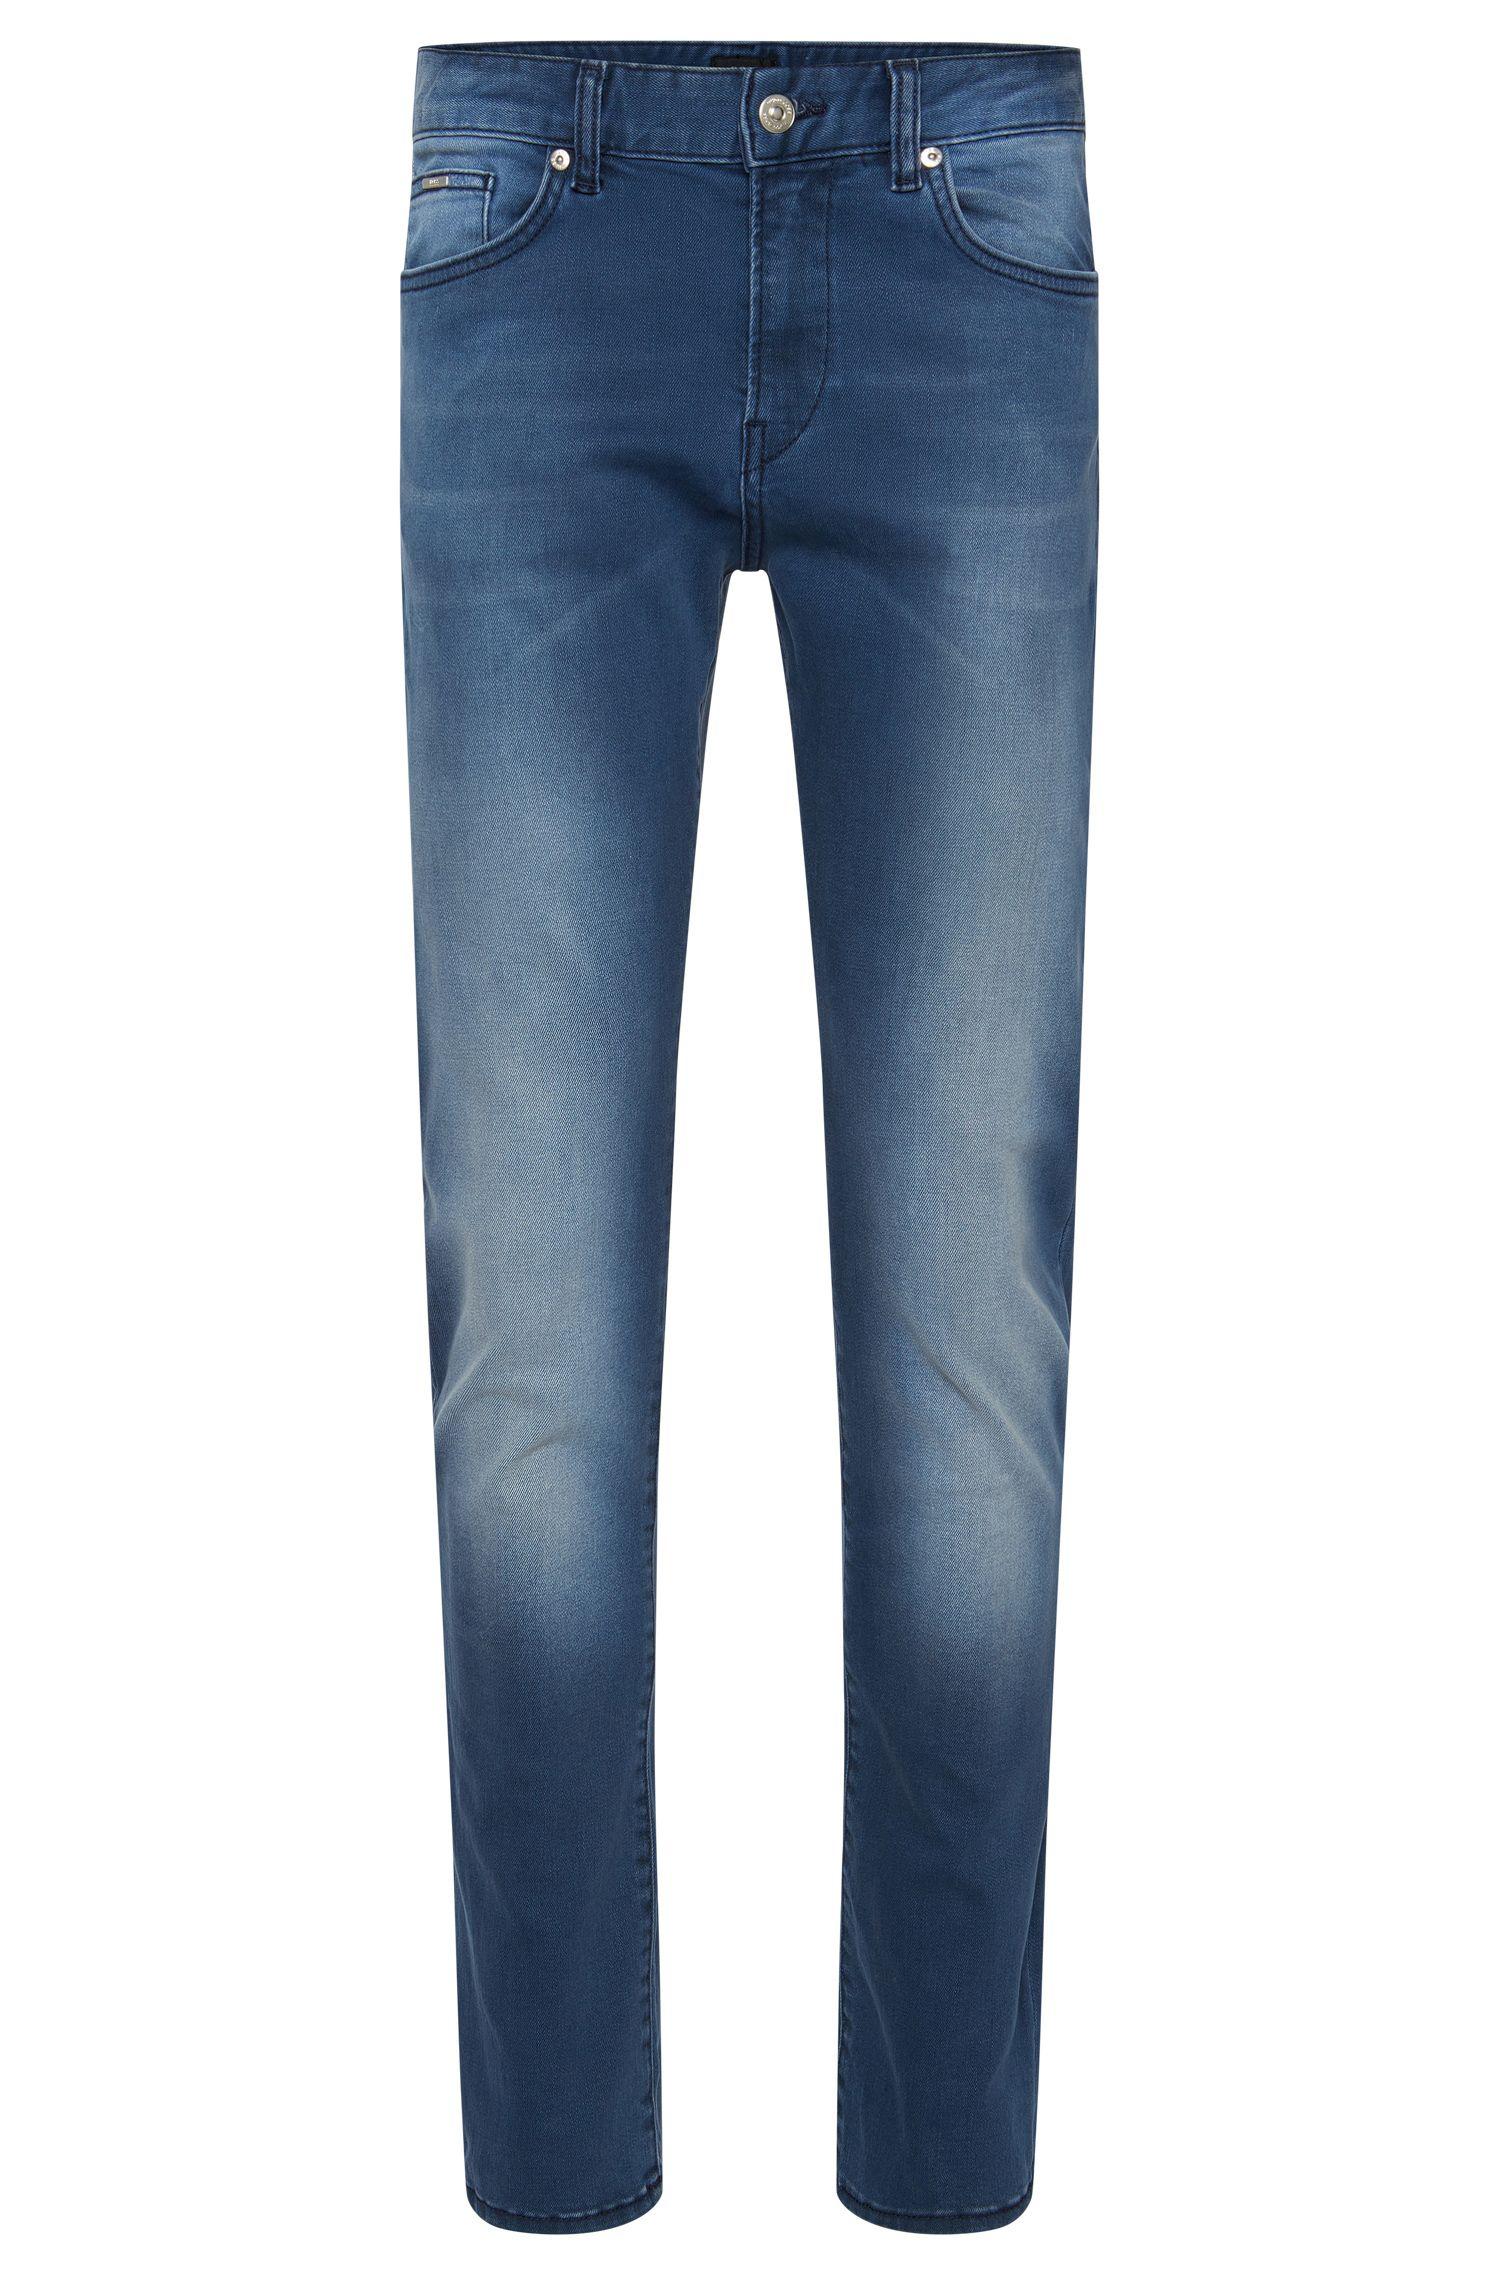 'Delaware' | Slim Fit, 11.25 oz Stretch Cotton Jeans